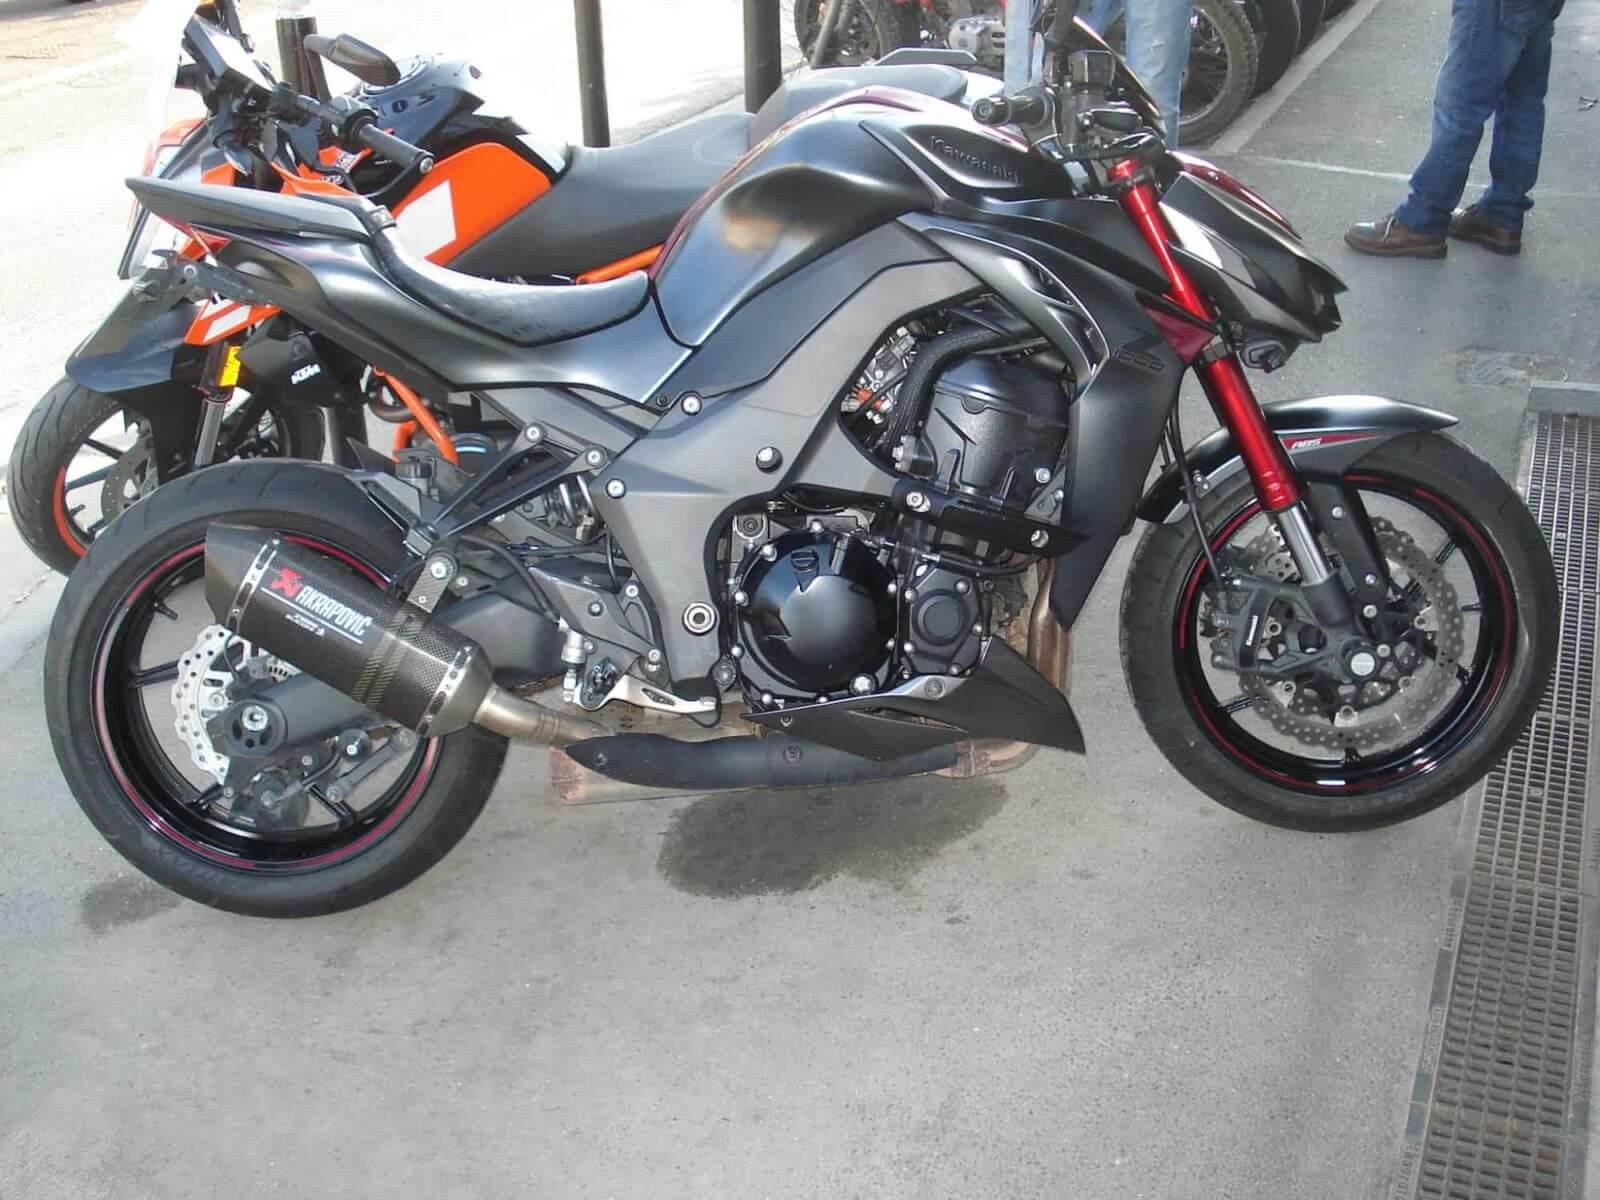 Vendu ! Kawasaki Z1000 – 8700€